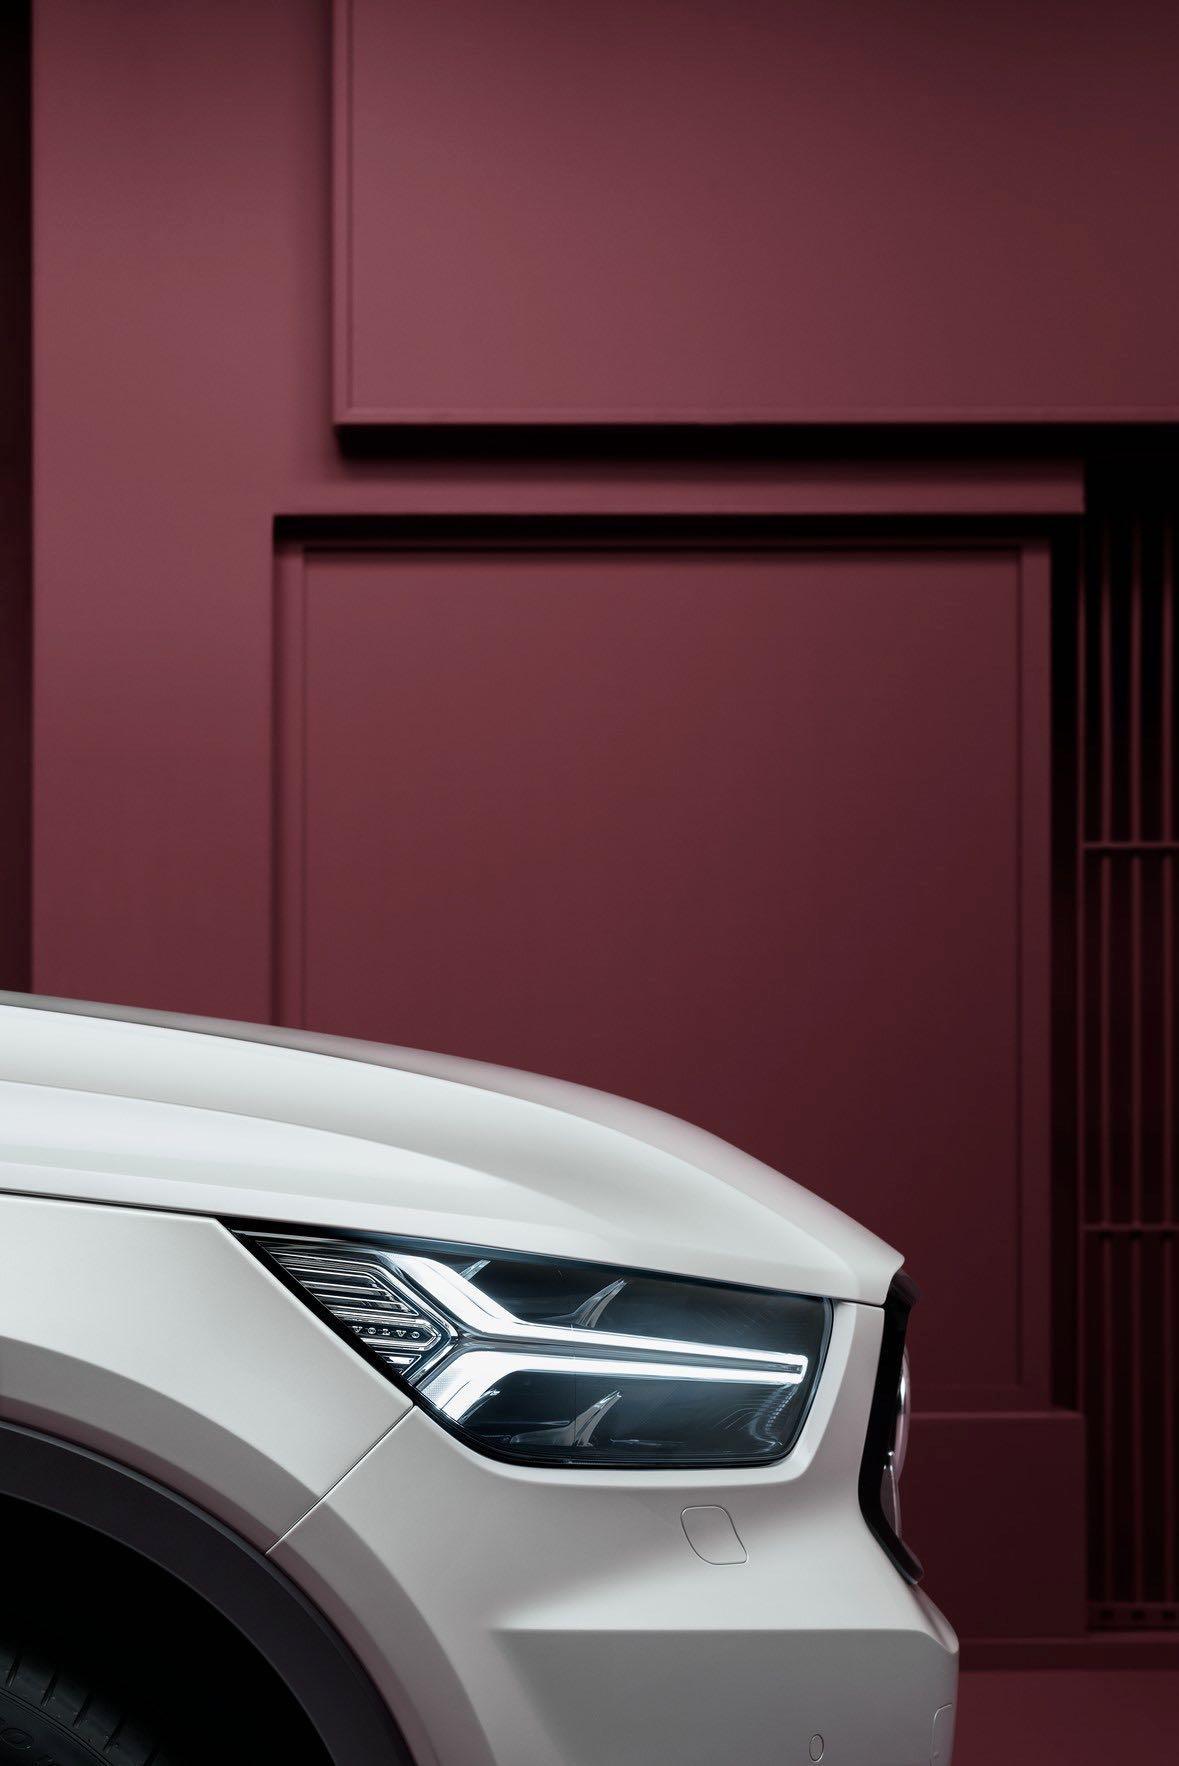 New Volvo XC40 Exterior Detail -  2017, 2018, 2018 New XC40, Design, Detail, Exterior, New XC40